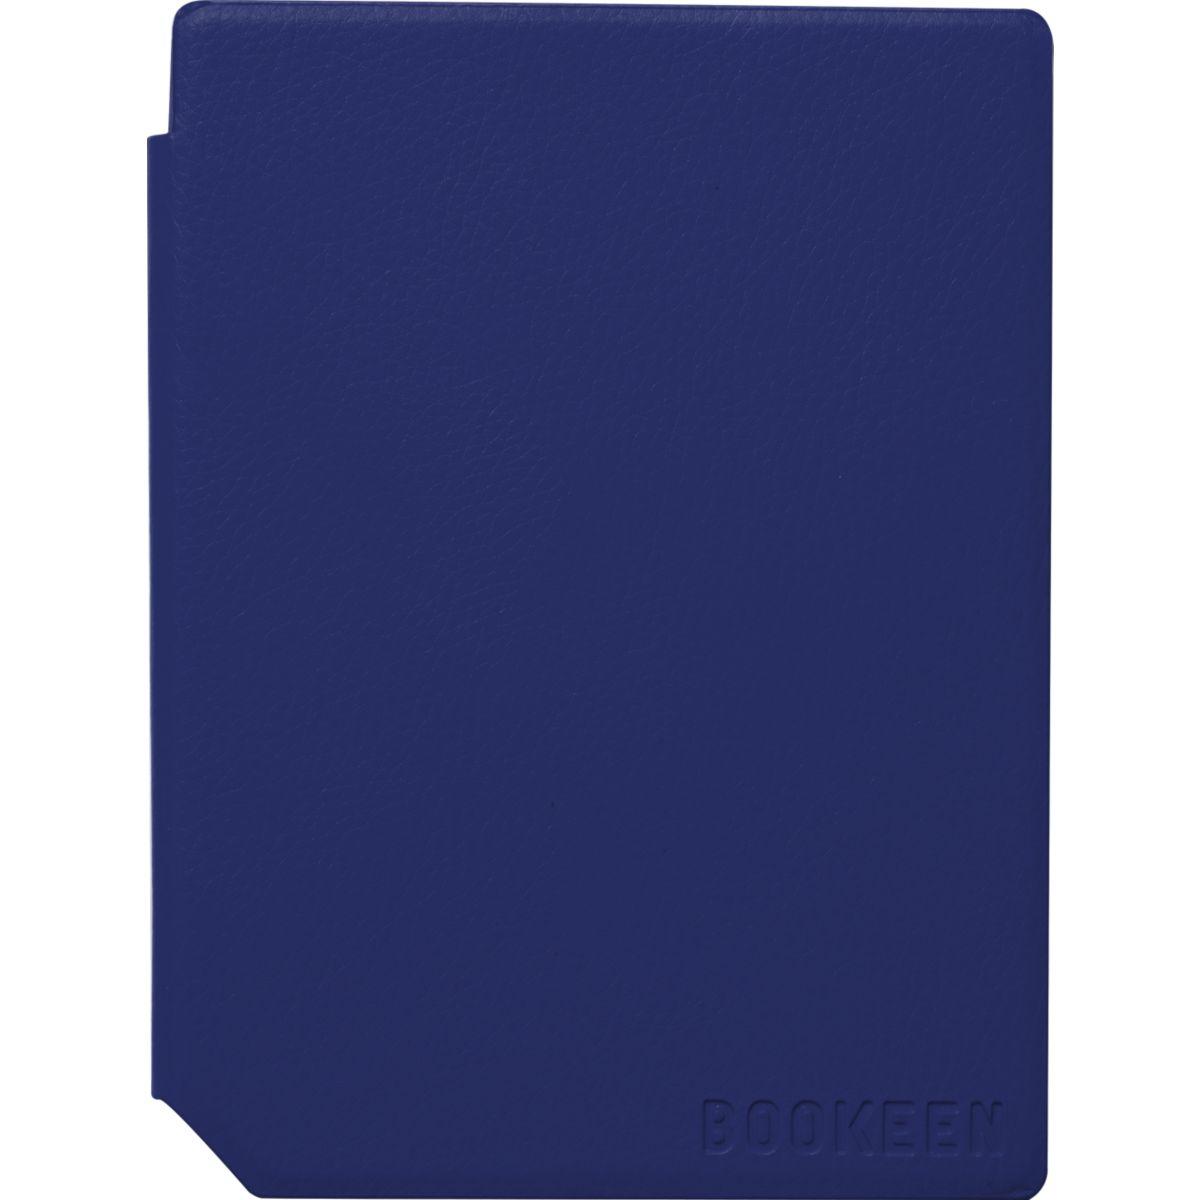 Etui BOOKEEN Cybook Muse bleu (photo)